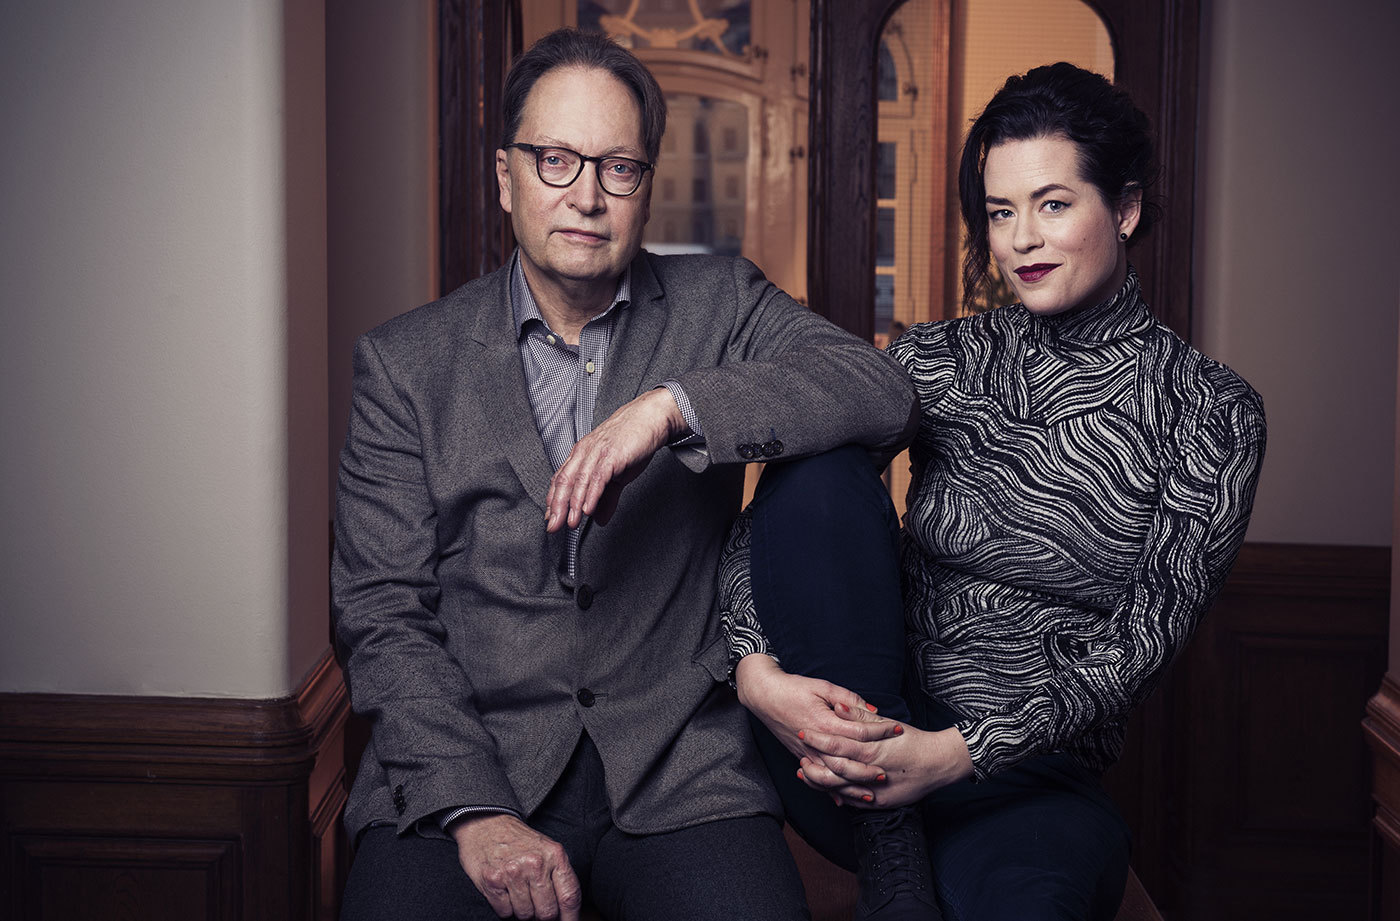 Horace Engdahl och Liv Strömqvist. Foto: Karl Nordlund/SVT